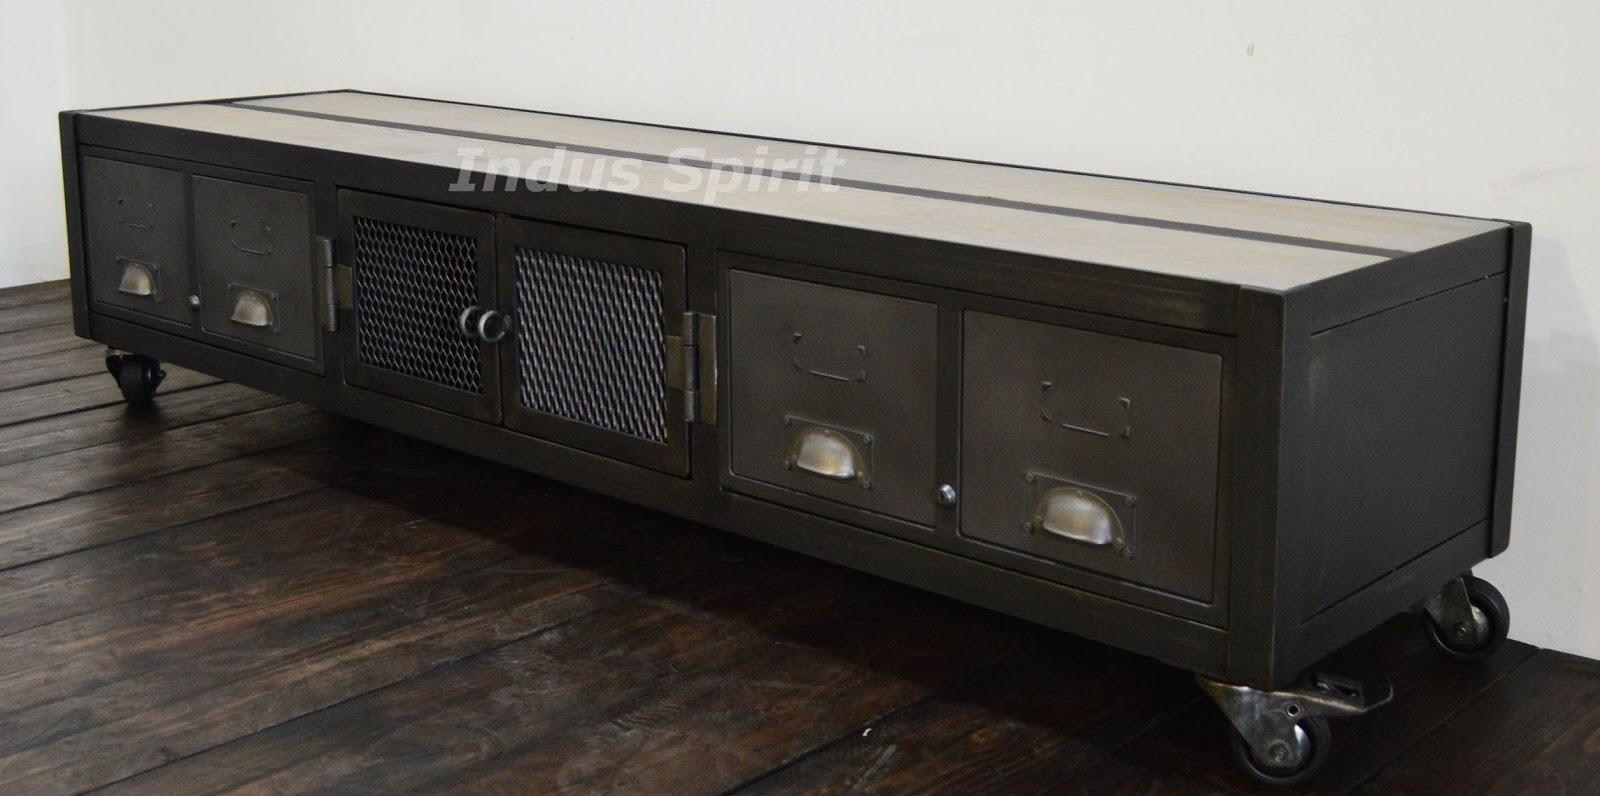 09 01 2012 10 01 2012 - Meuble tele industriel ...